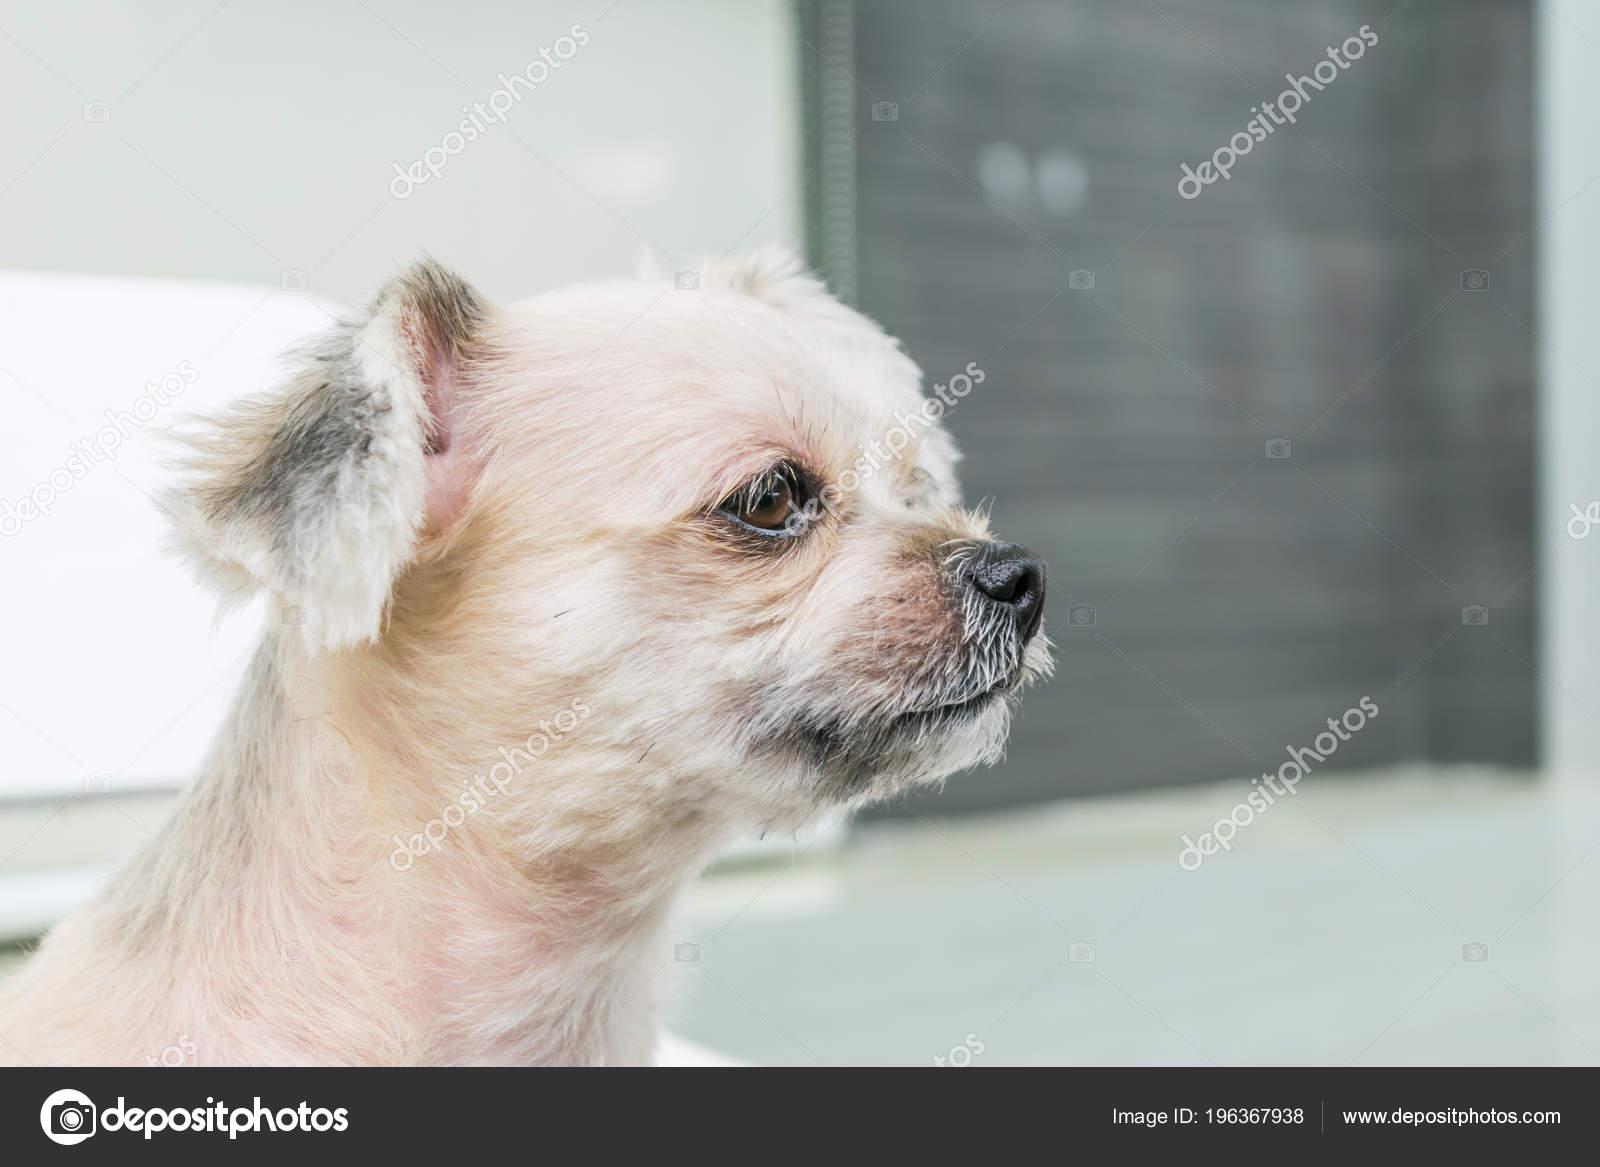 Dog Cute Mixed Breed Shih Tzu Pomeranian Poodle Looking Something Stock Photo C Pongmoji 196367938